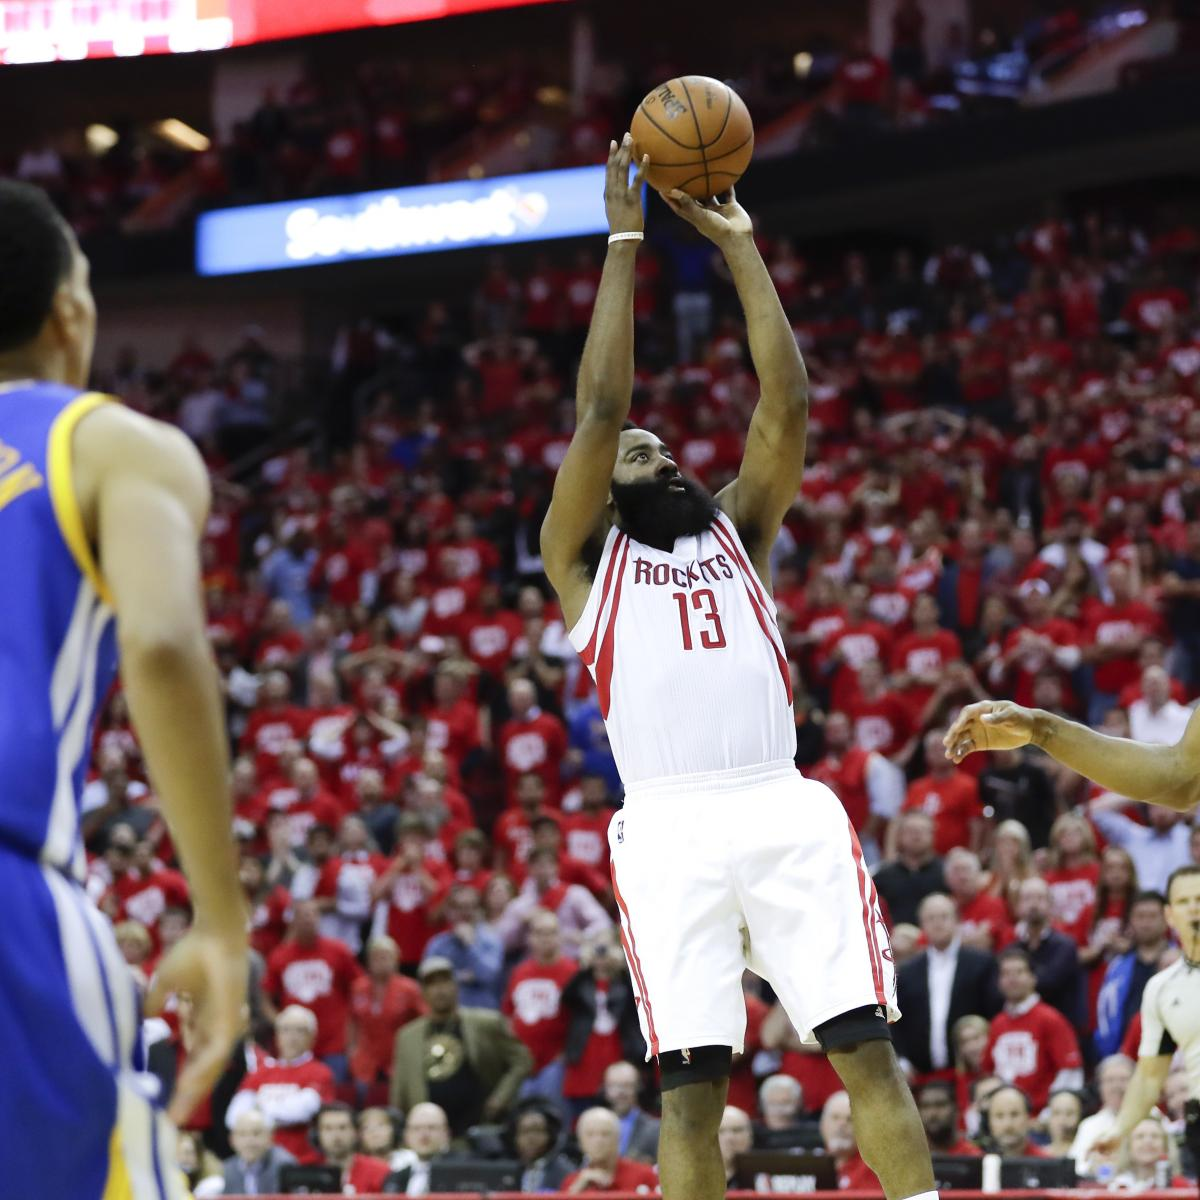 Rockets Vs Warriors James Harden: James Harden Comments On NBA Ruling He Pushed Off On Game